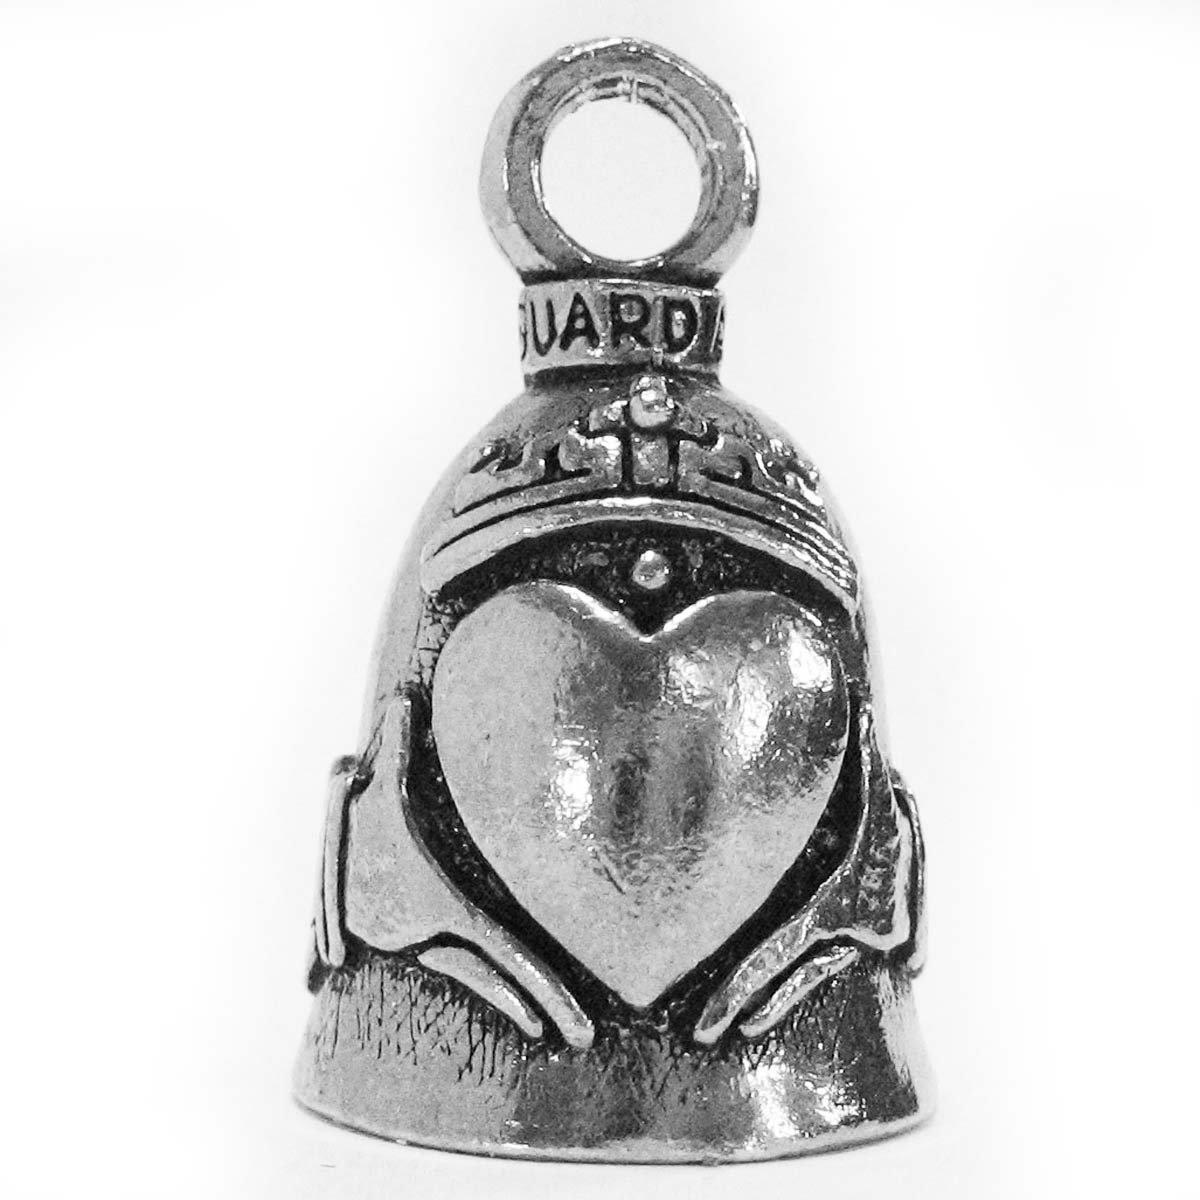 Guardian/® Celtic Claddagh Heart Motorcycle Biker Luck Gremlin Riding Bell Vance 4350397482